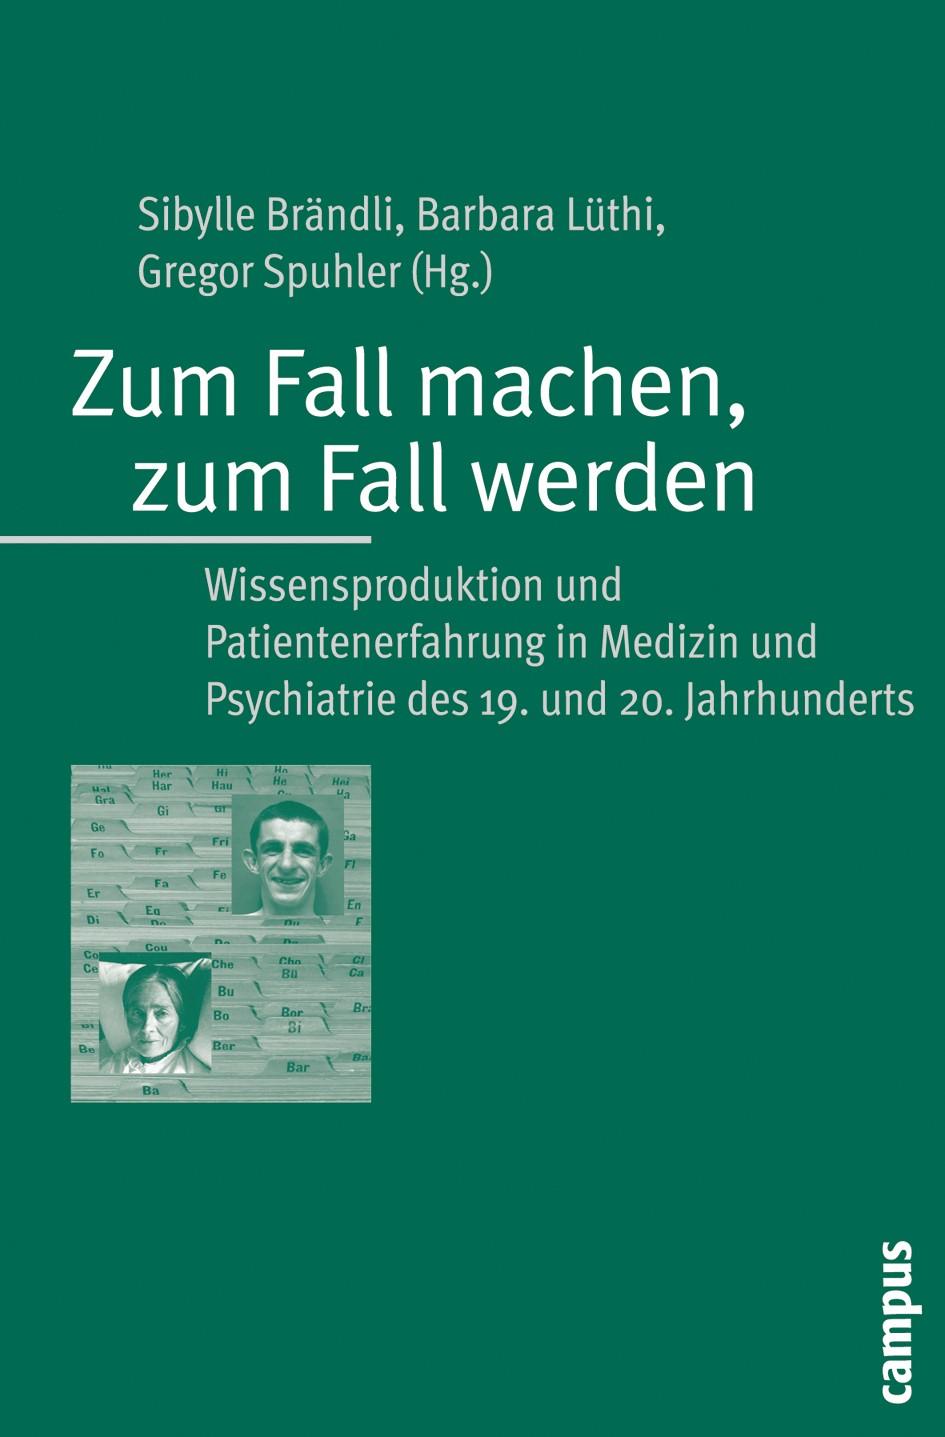 Zum Fall machen, zum Fall werden | Brändli / Lüthi / Spuhler, 2009 | Buch (Cover)